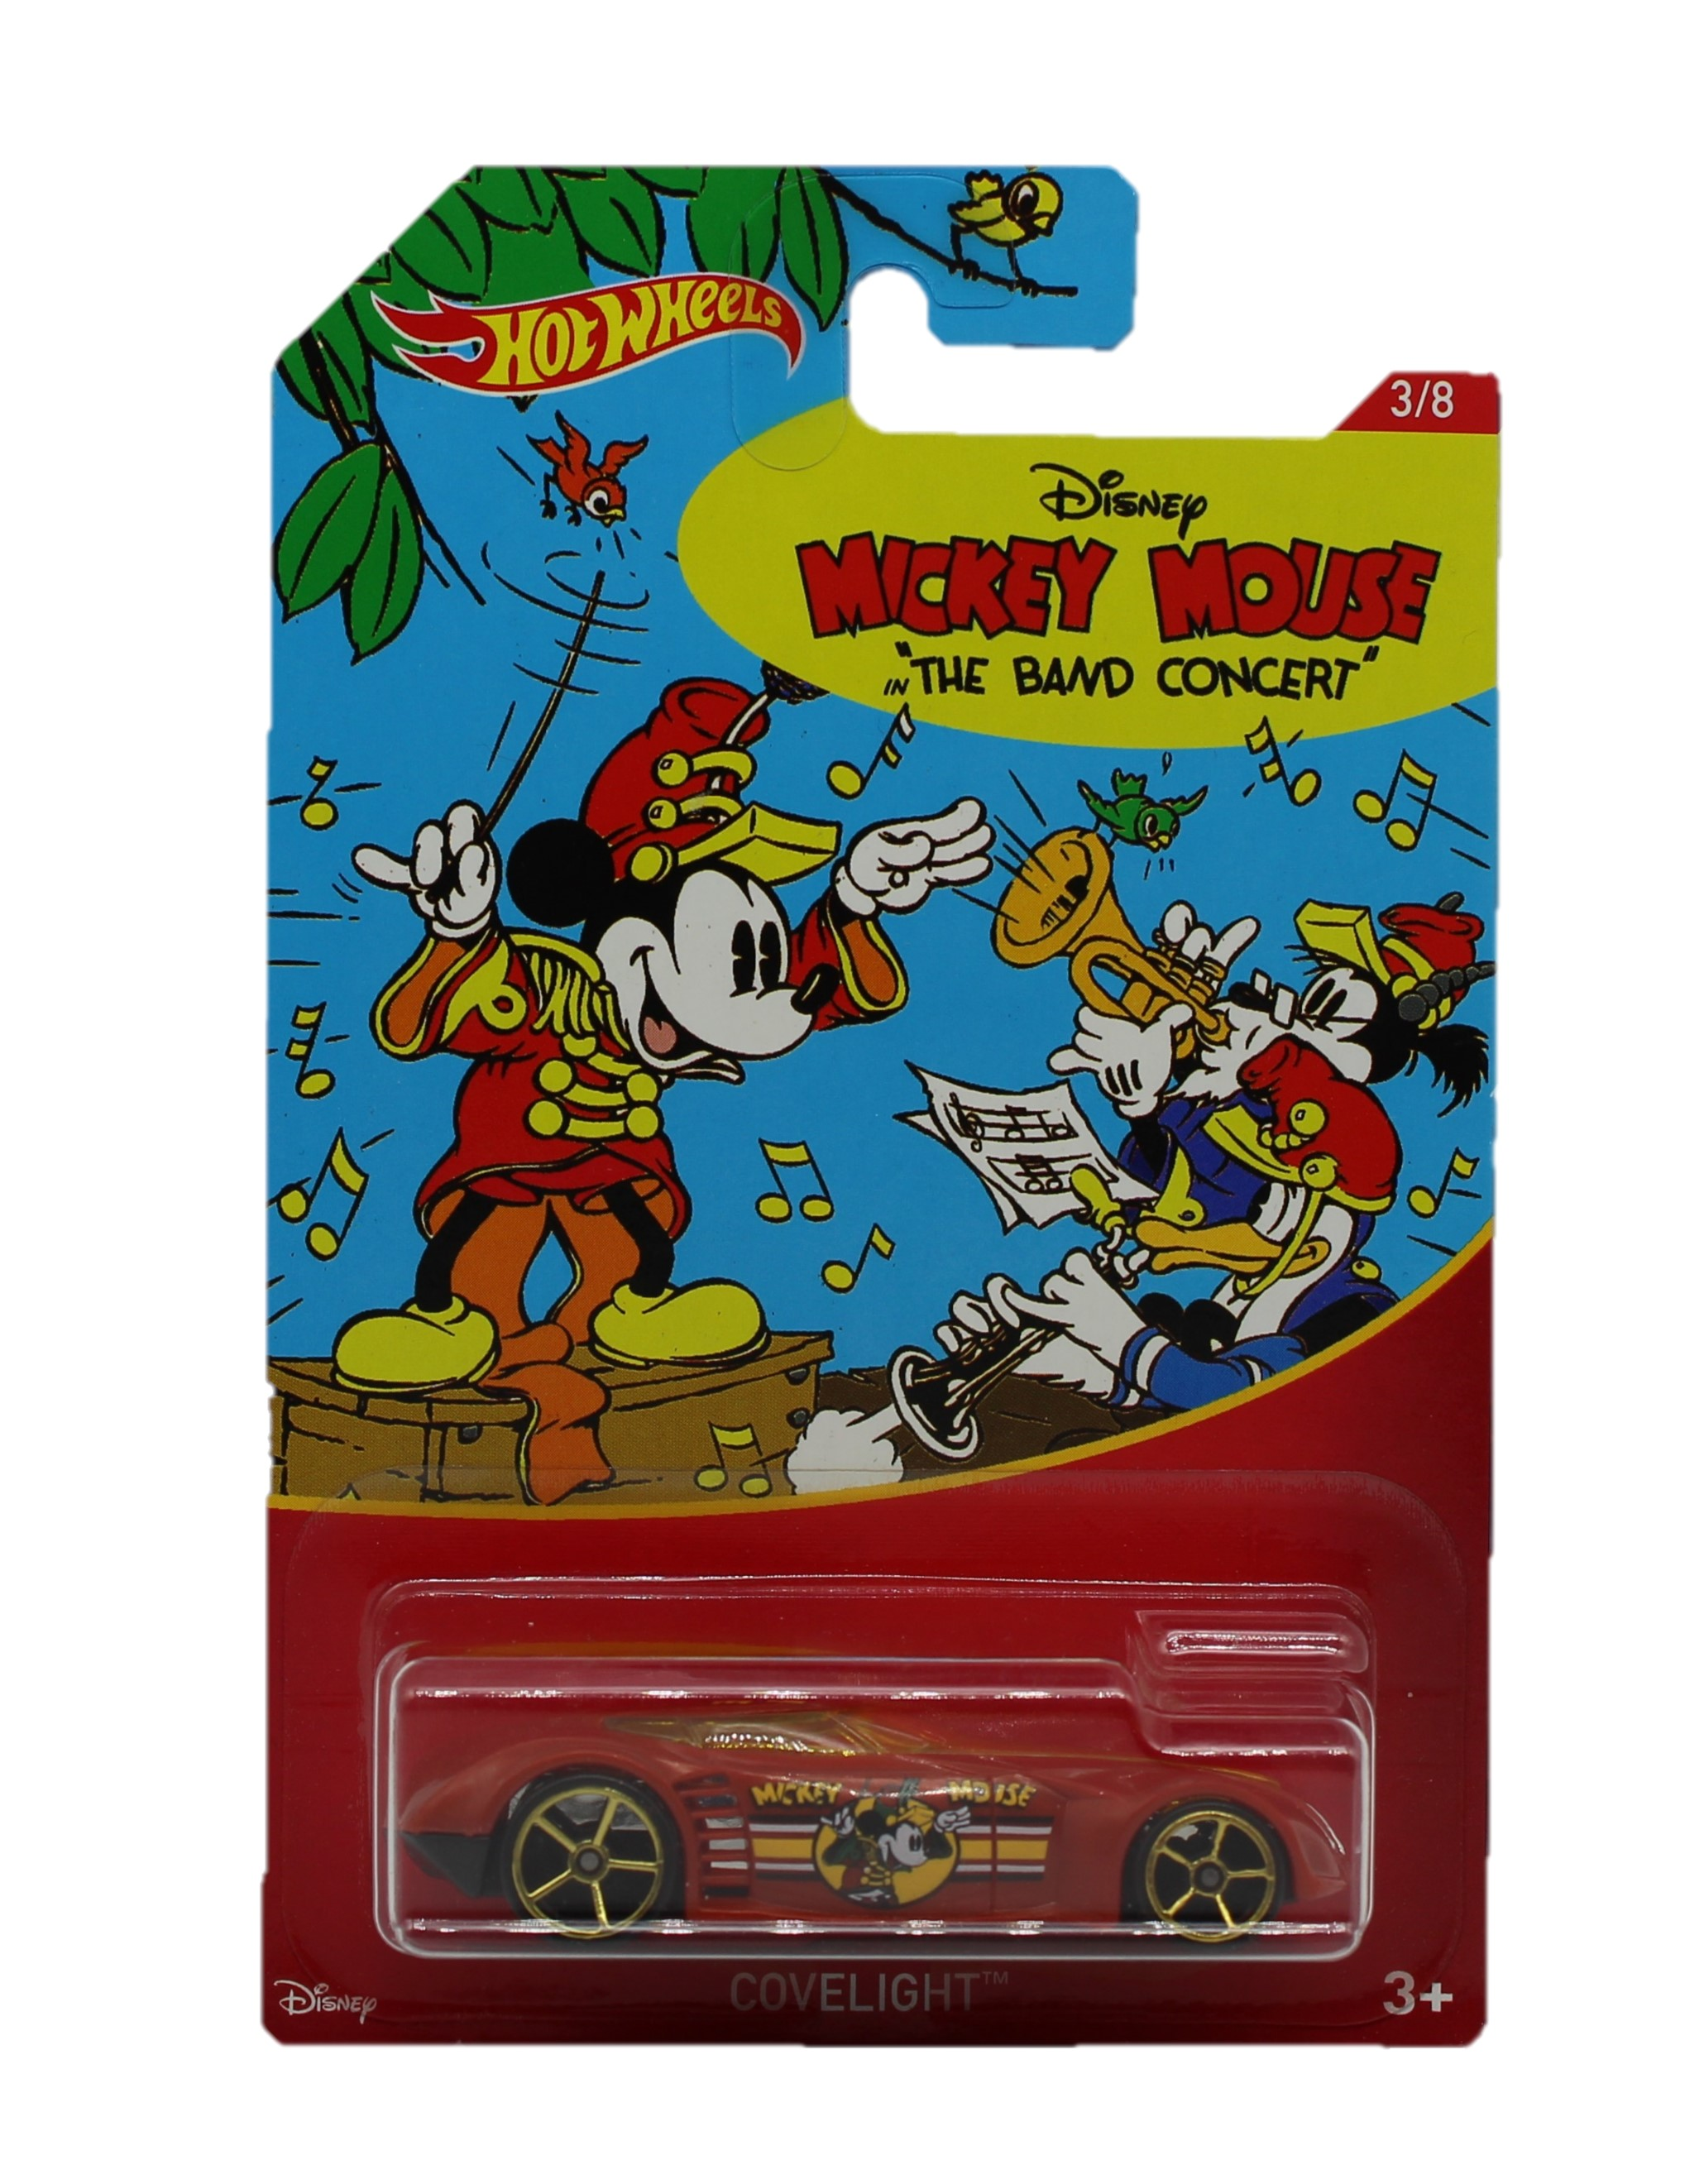 Hot Wheels Disney Mickey Mouse Fahrzeug Covelight